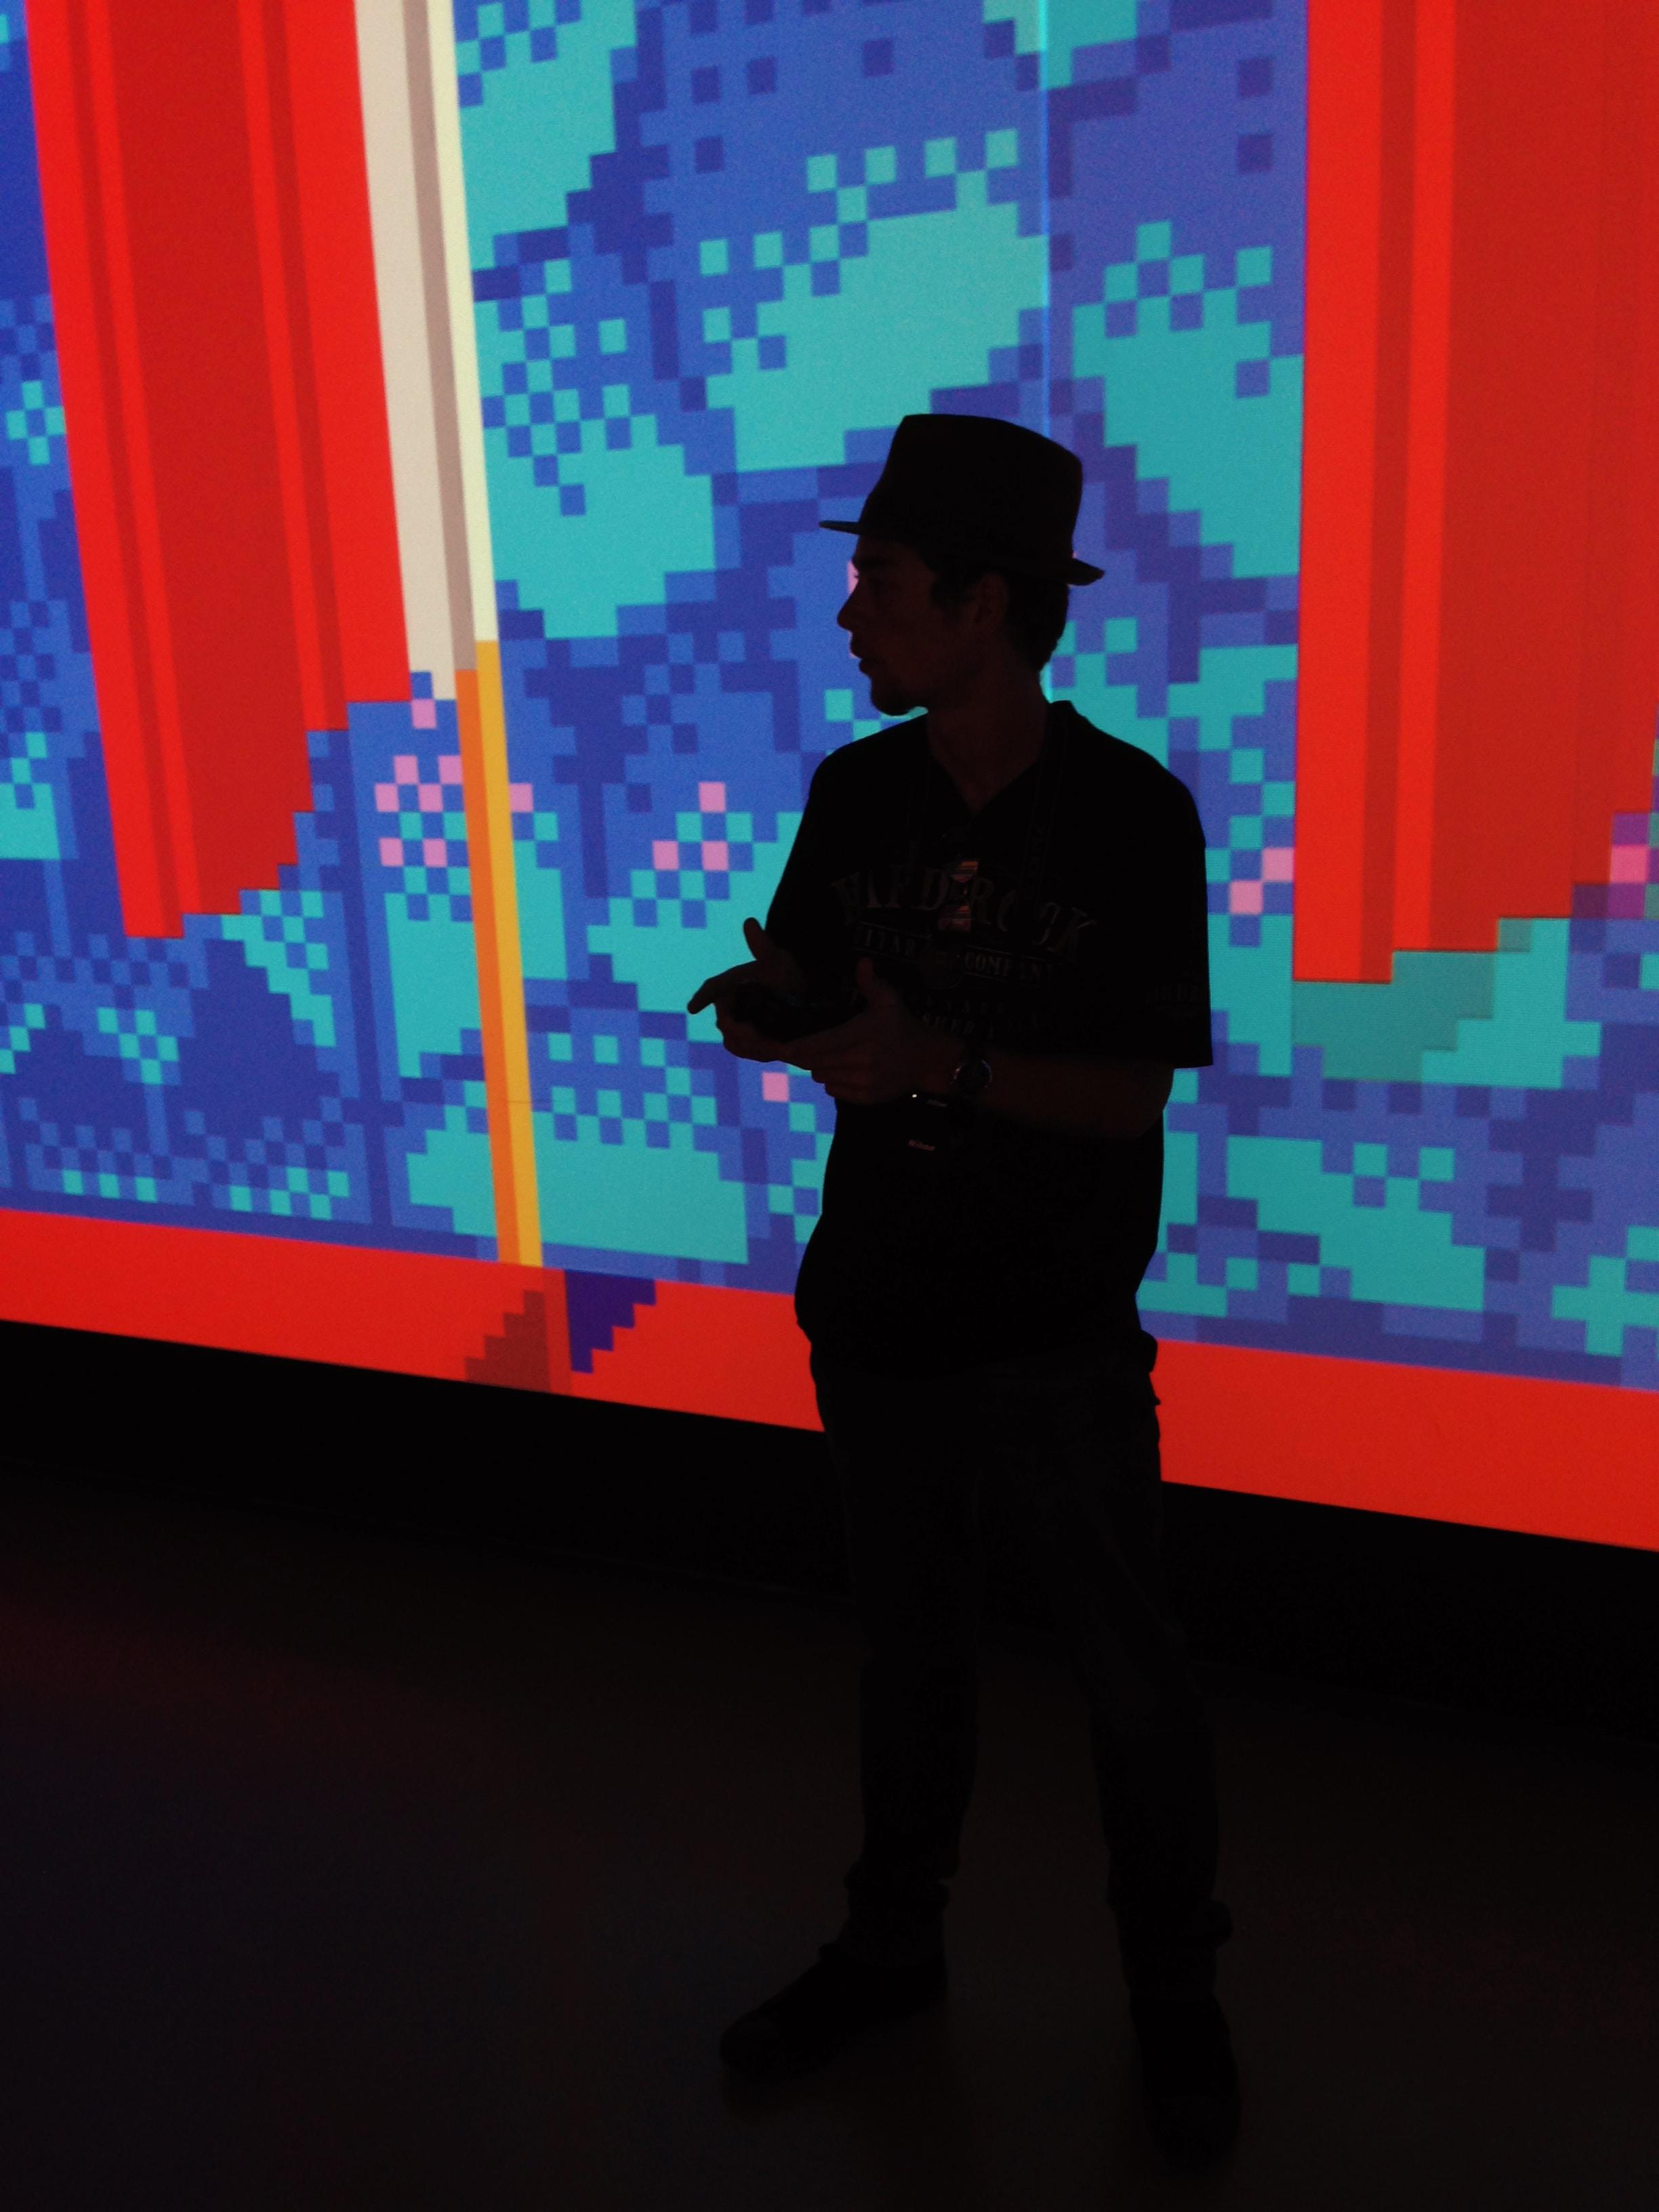 silhouette of man near multicolored wall